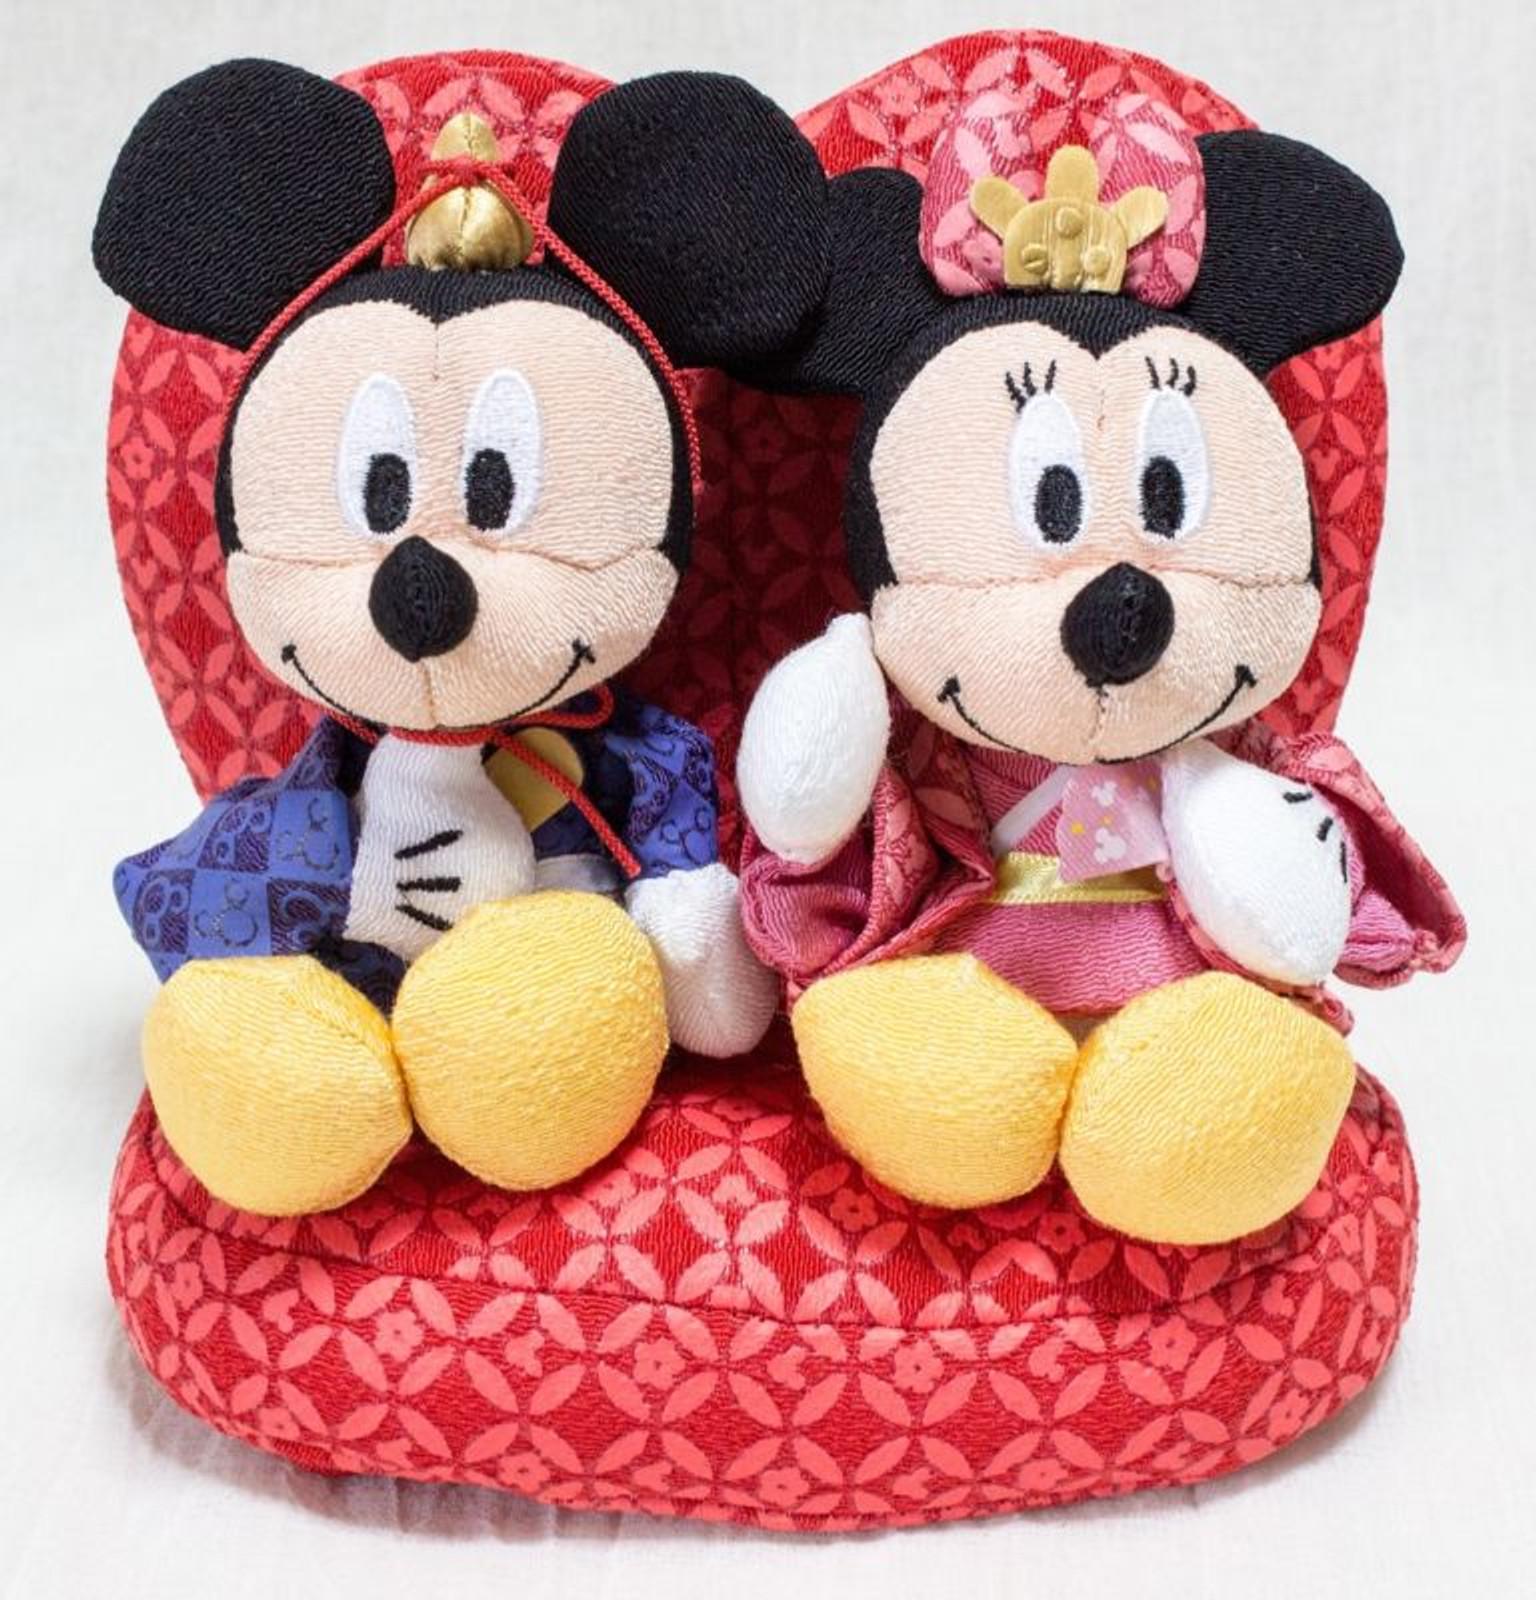 Mickey Mouse Japanese Hina-Matsuri Kimono Plush Dolls set TOMY JAPAN FIGURE